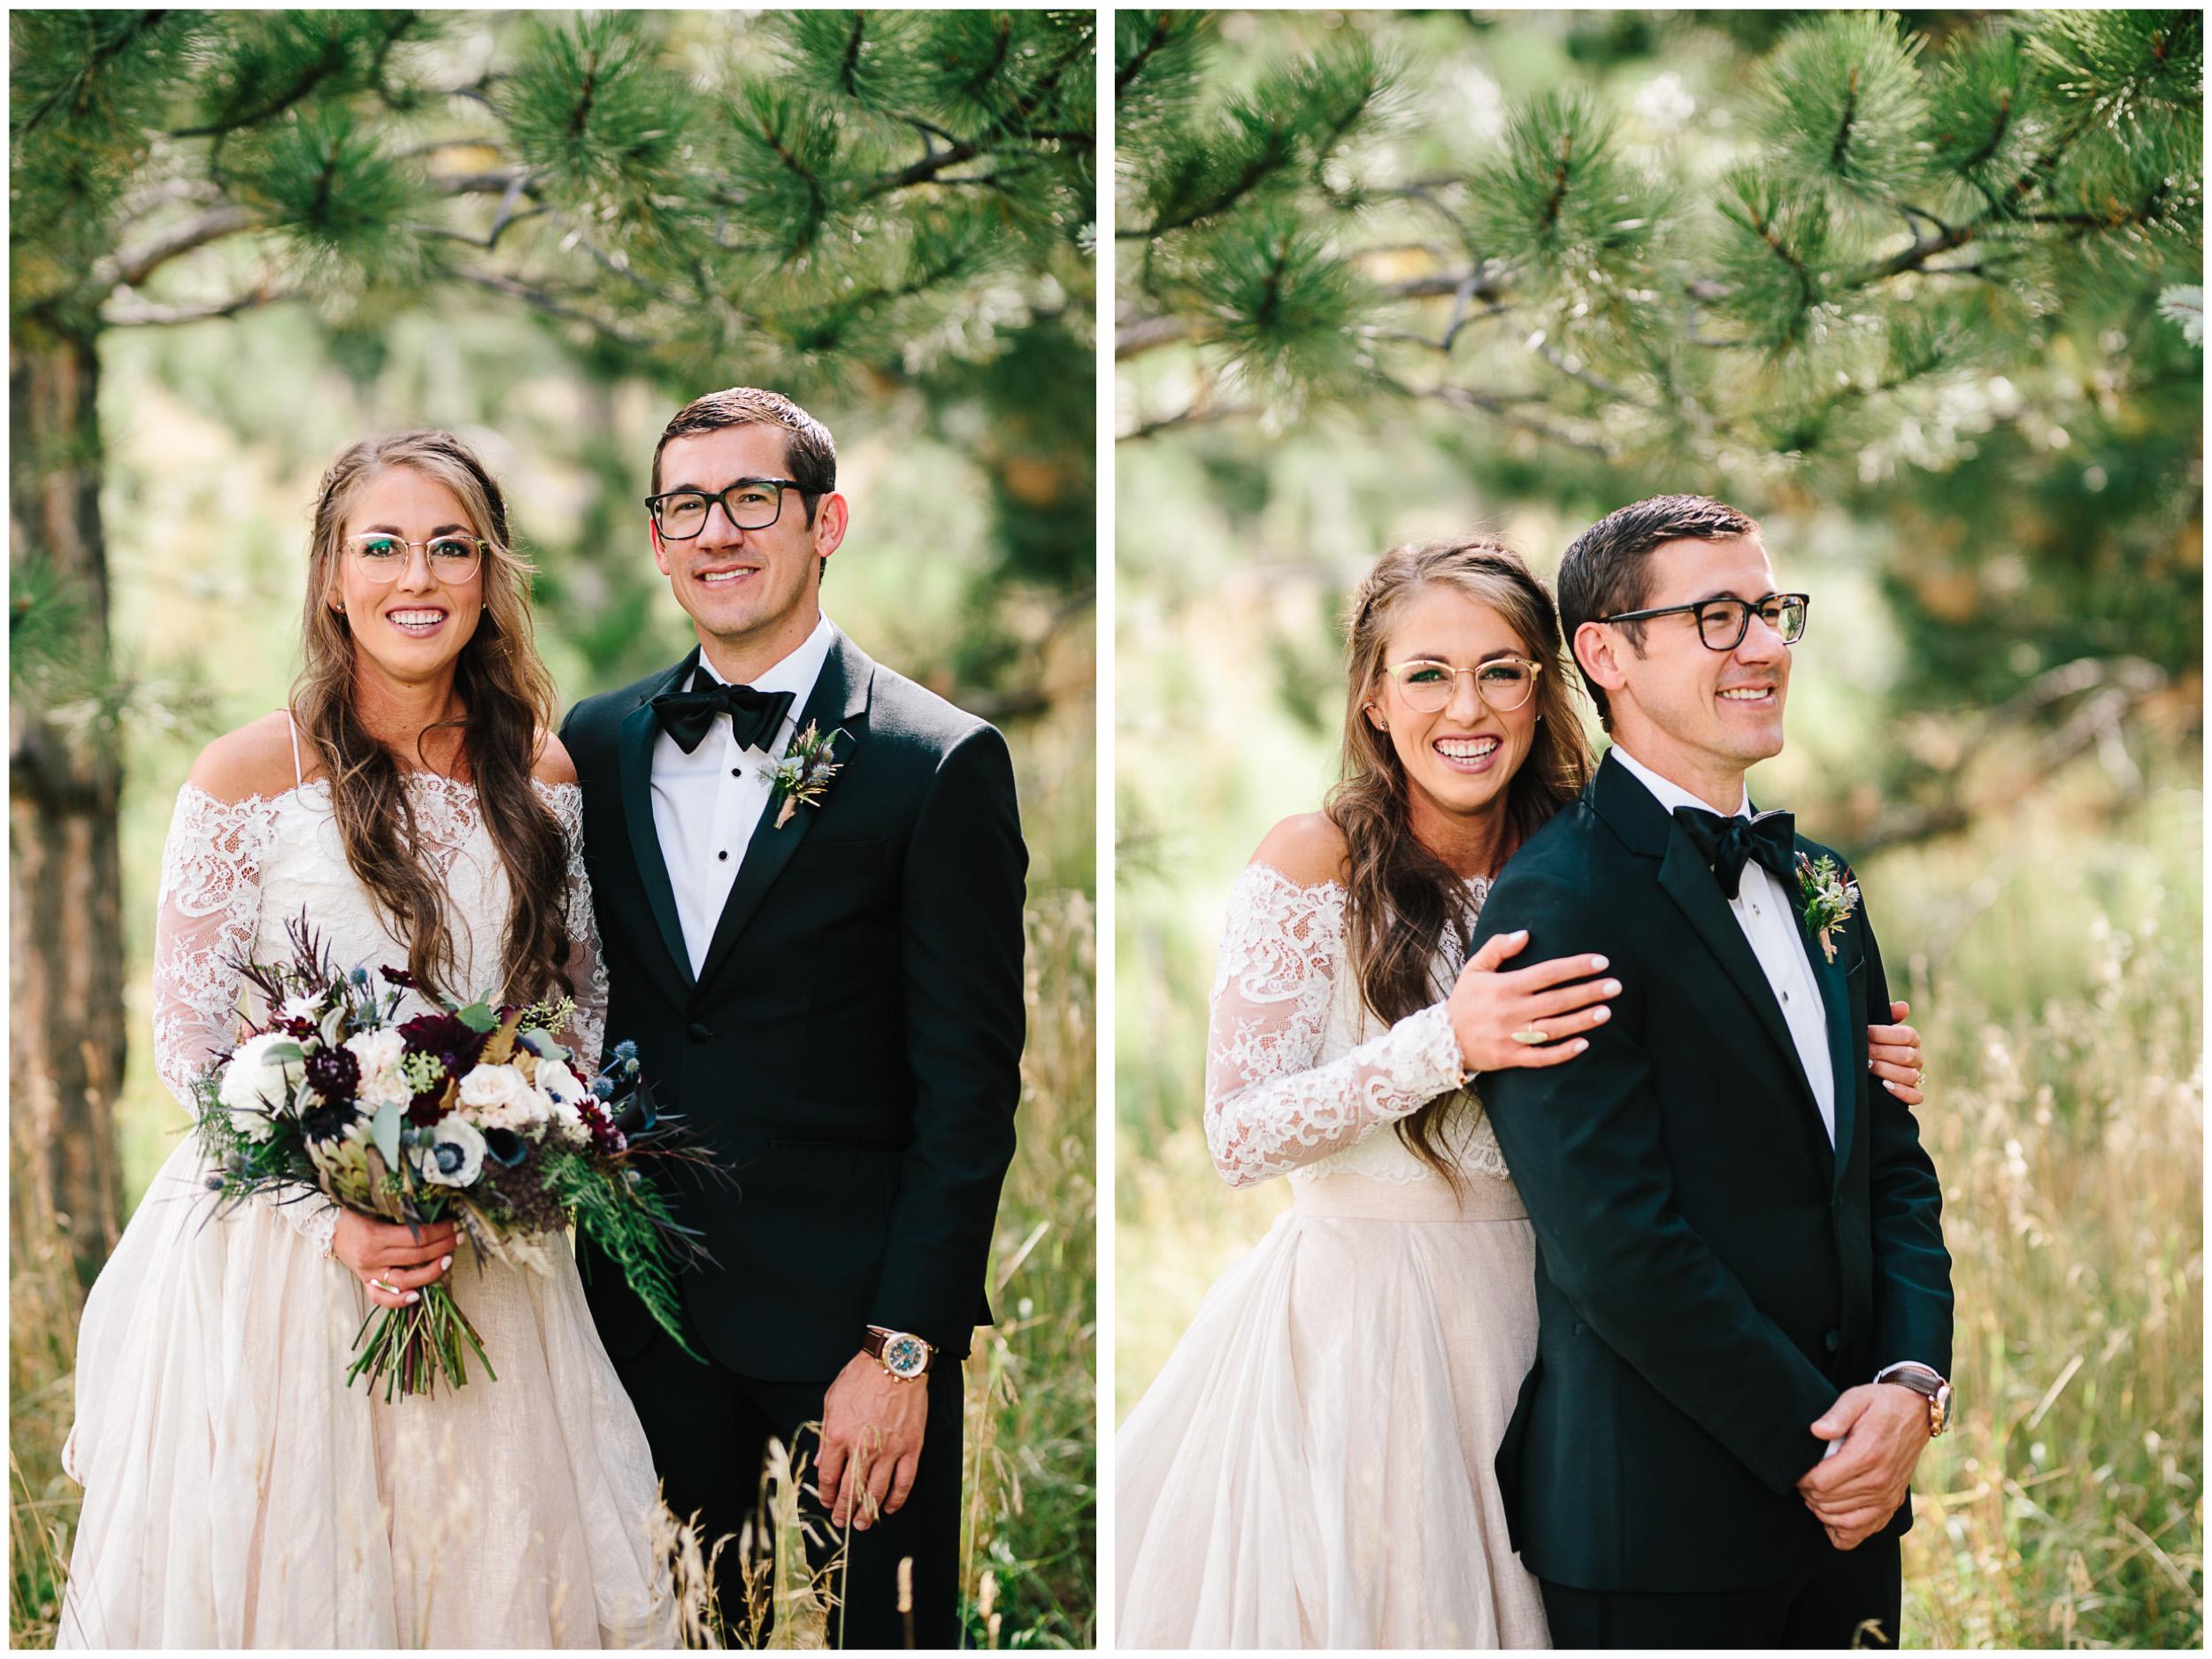 spruce_mountain_ranch_wedding_33.jpg